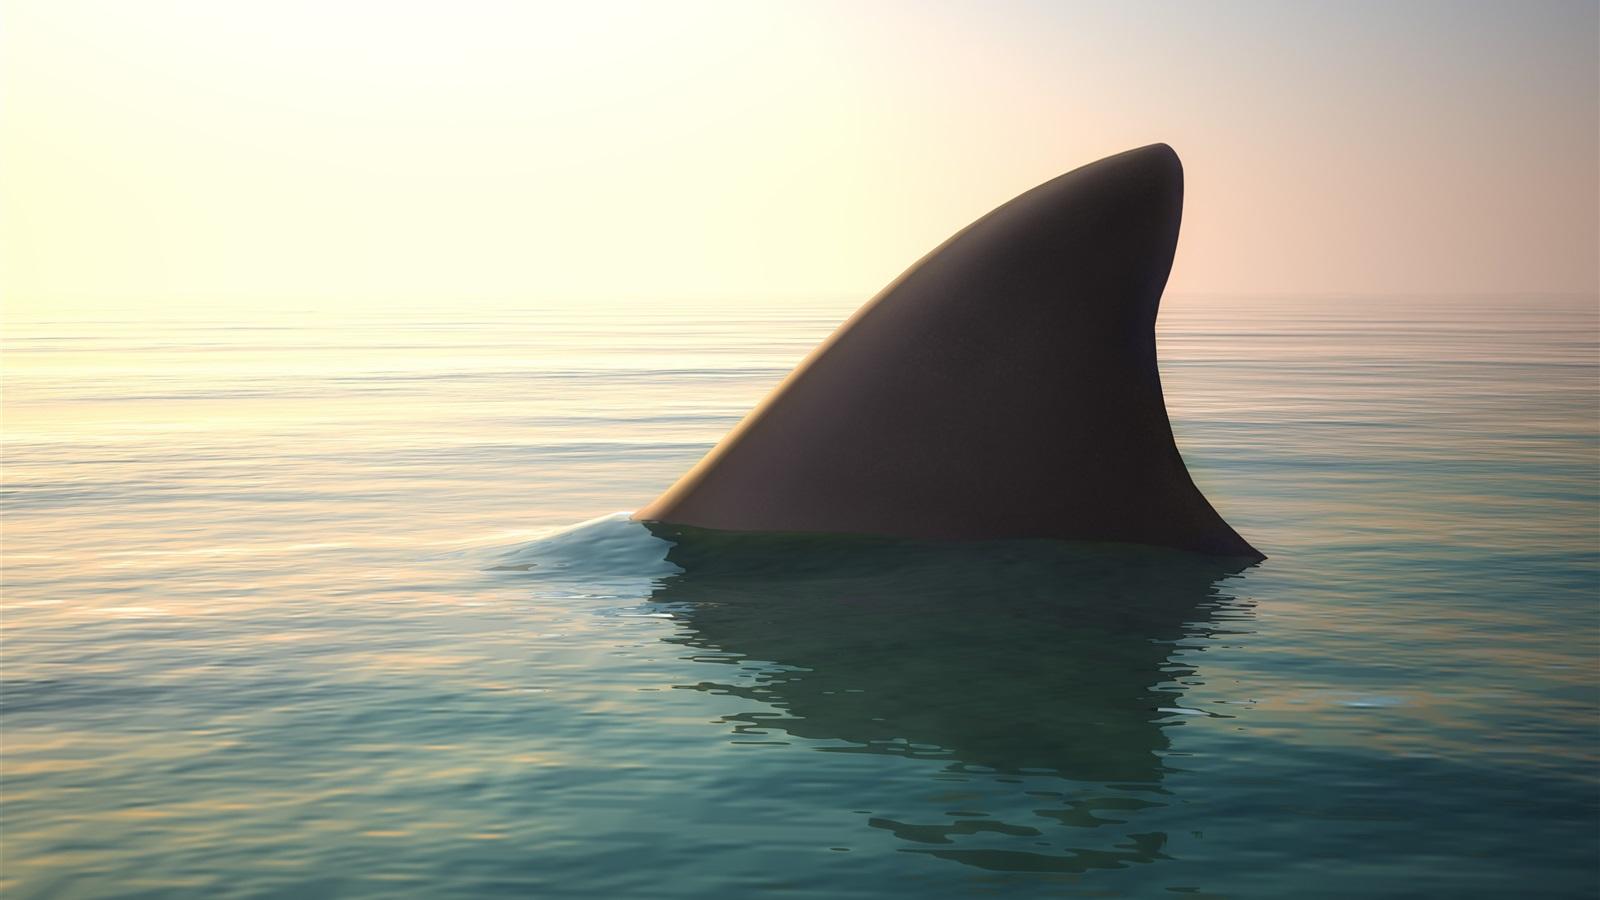 Wallpaper Shark, fin, water, ocean 2560x1600 HD Picture, Image